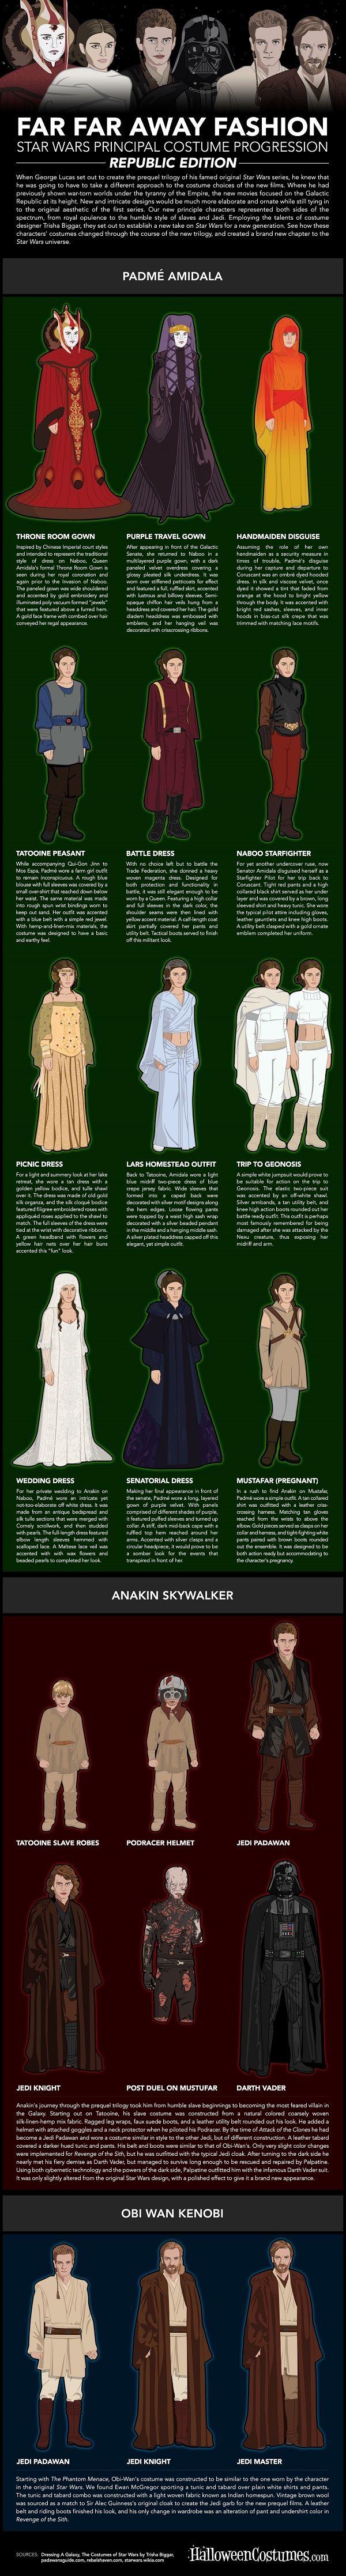 Star Wars Prequel Costumes Infographic